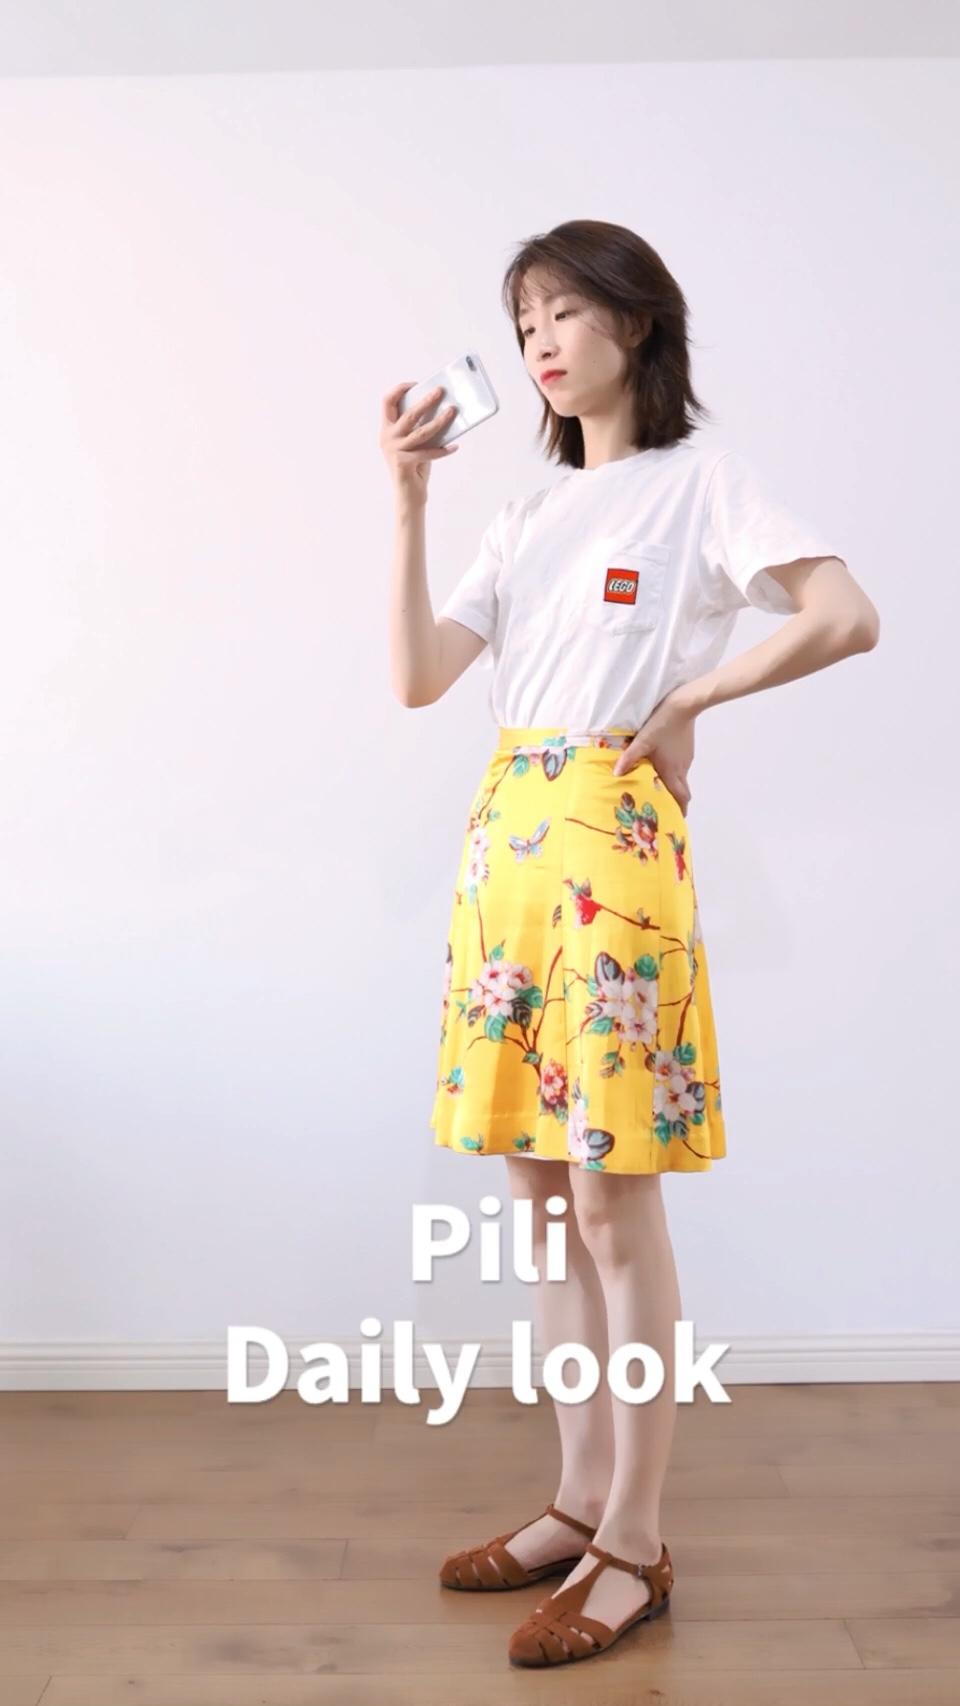 pili dailylook T恤: 优衣库 裙: my topbuyer 鞋: church's 裙子大概就和六七月的阳光一样耀眼了,非常抢戏的色彩,只要一些基础色压一下就好,别的配饰也是多余 #小个子穿什么一键拉长比例#